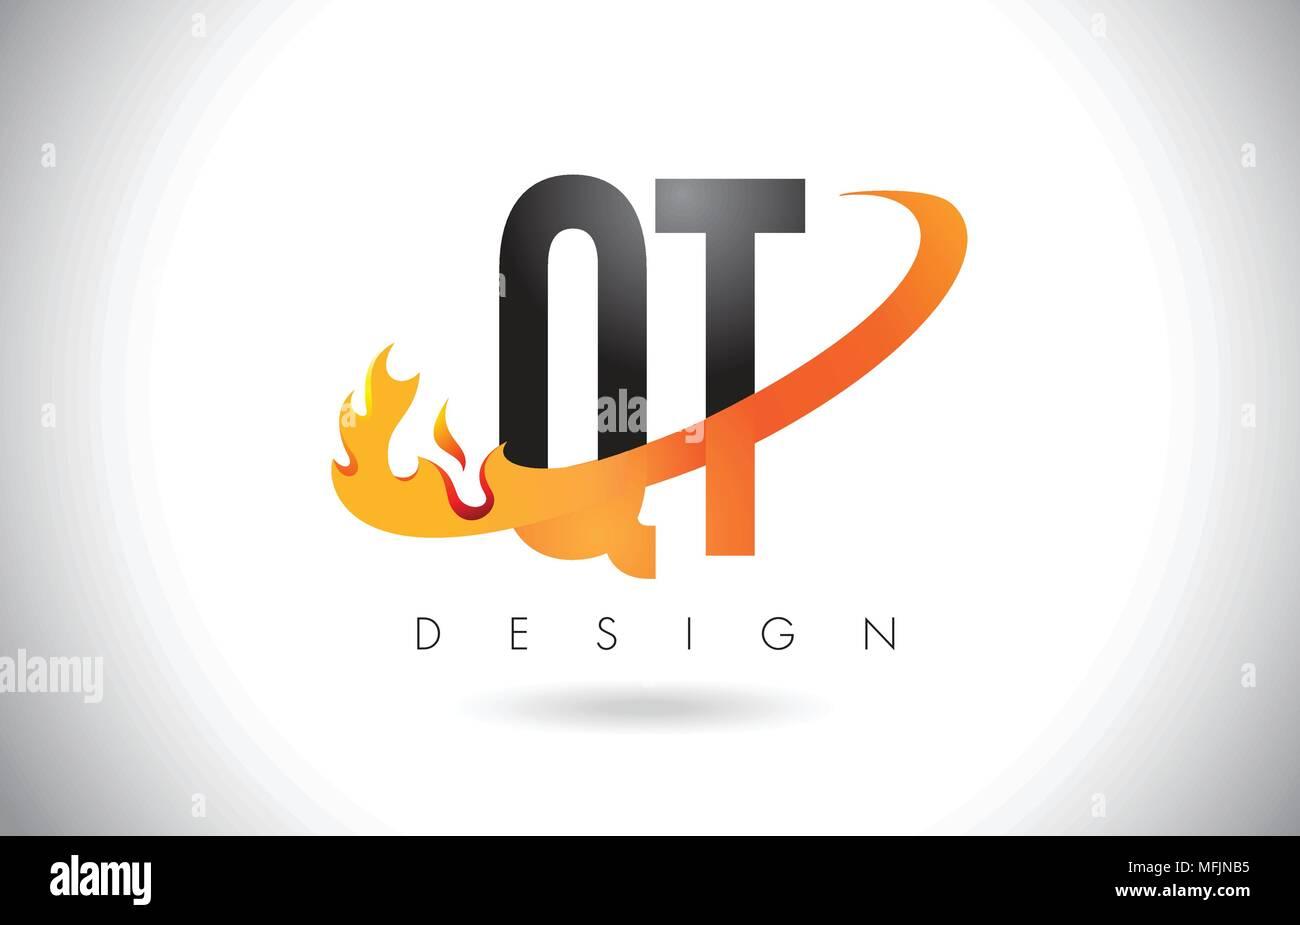 QT Q T Letter Logo Design with Fire Flames and Orange Swoosh Vector Illustration. - Stock Image